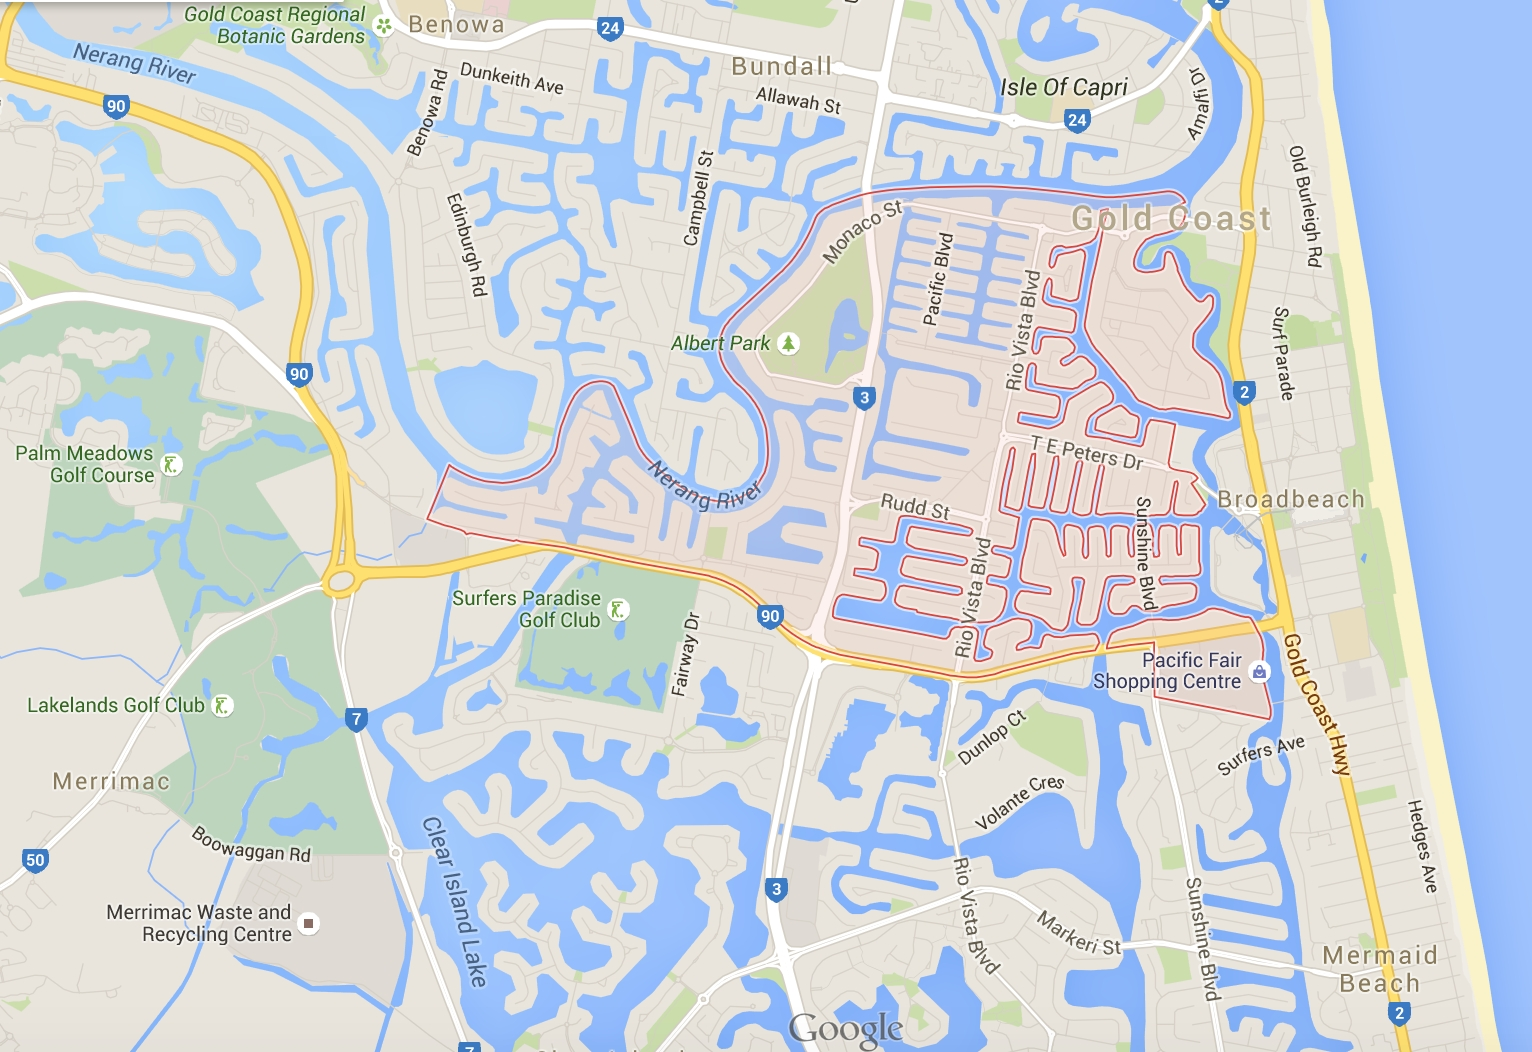 Greensocks - Easiest Lawnmowing In Broadbeach Waters! with regard to Map Of Miami Beach Queensland